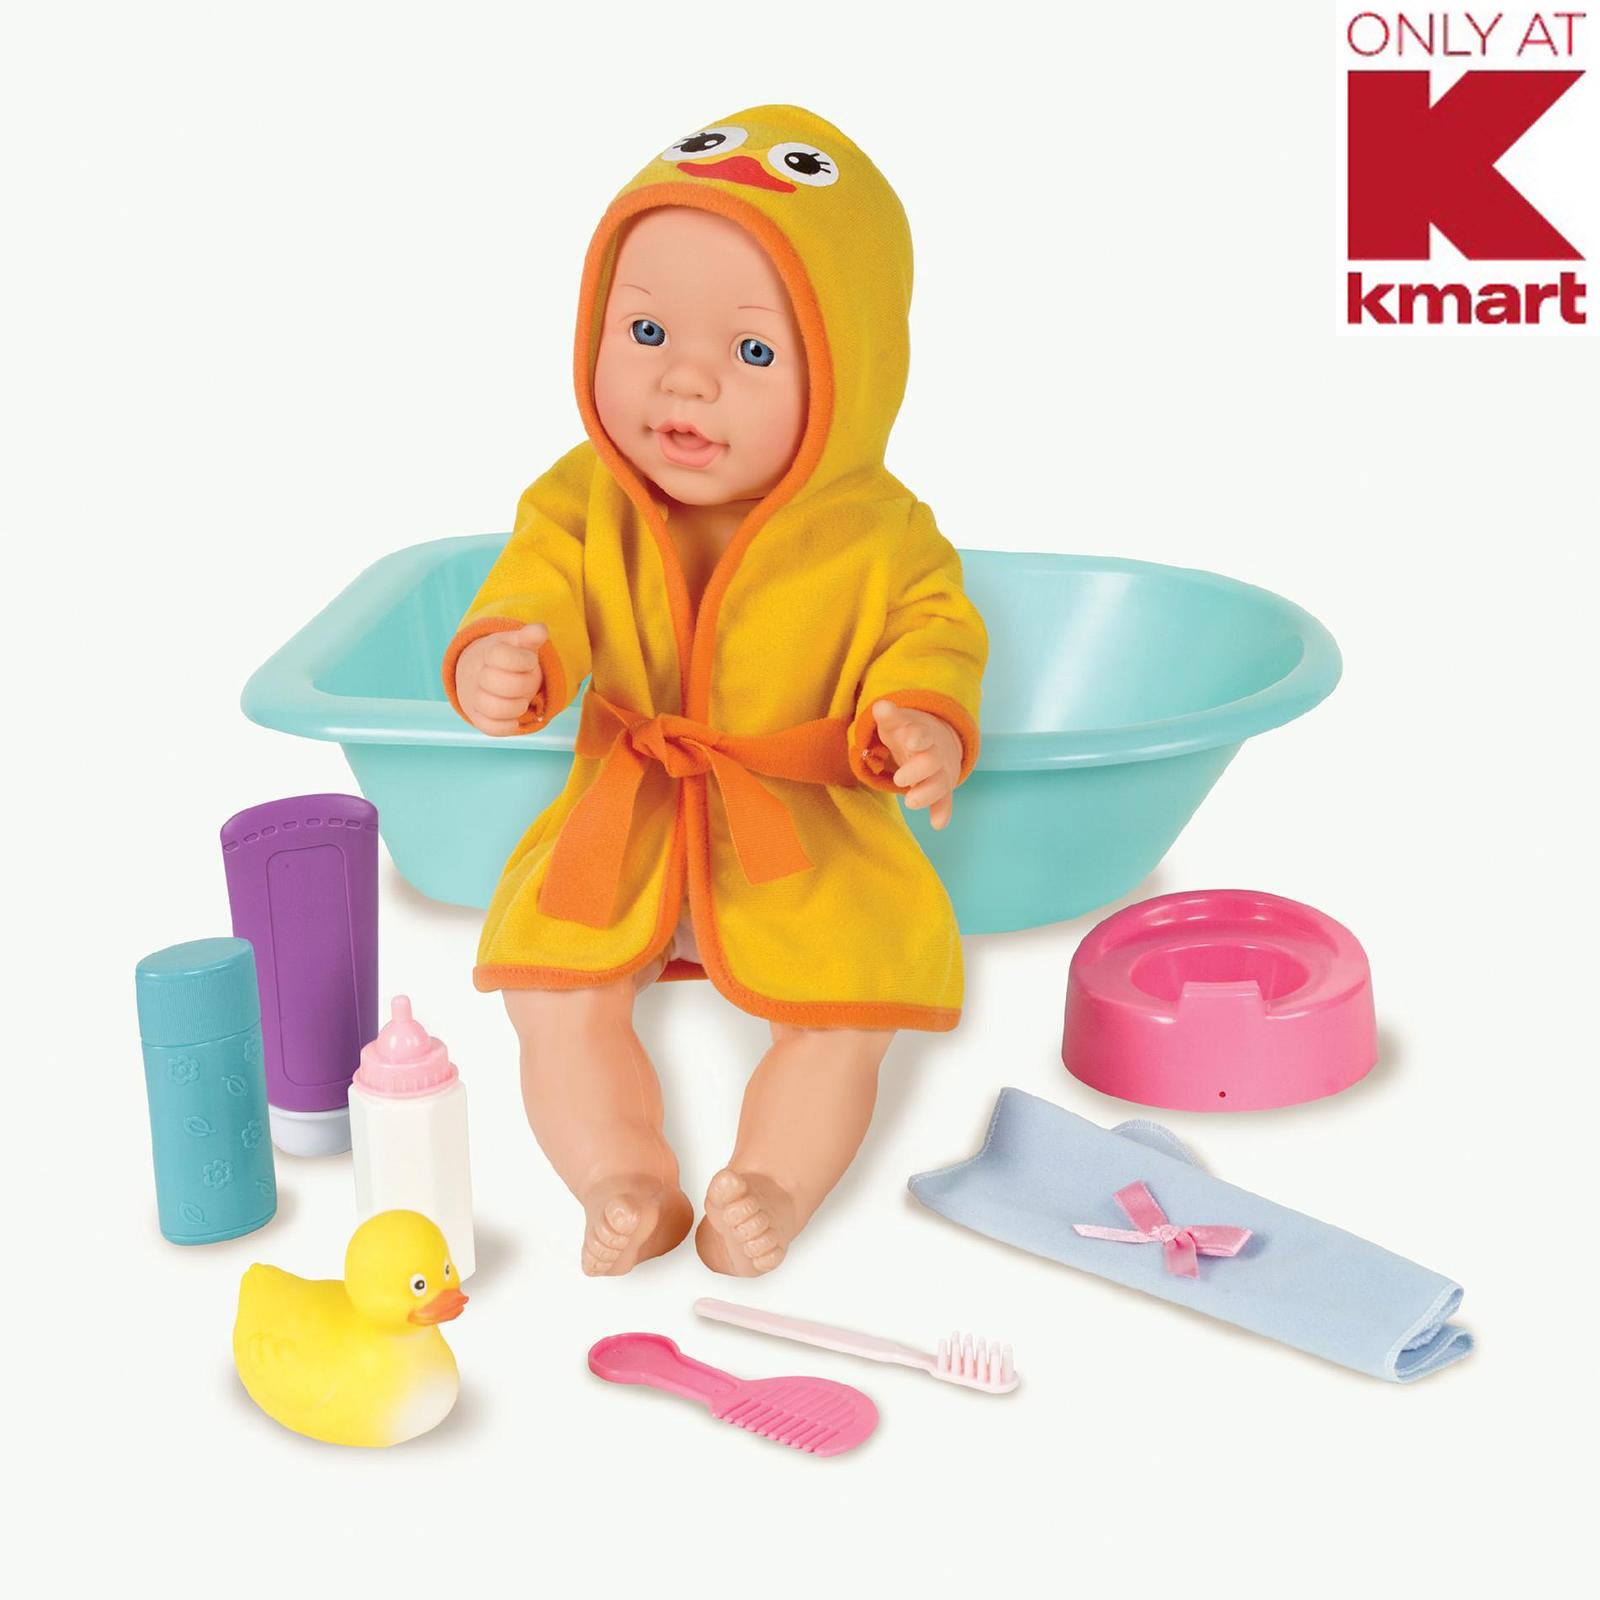 Just Kidz 15 Baby Doll With Bath Set